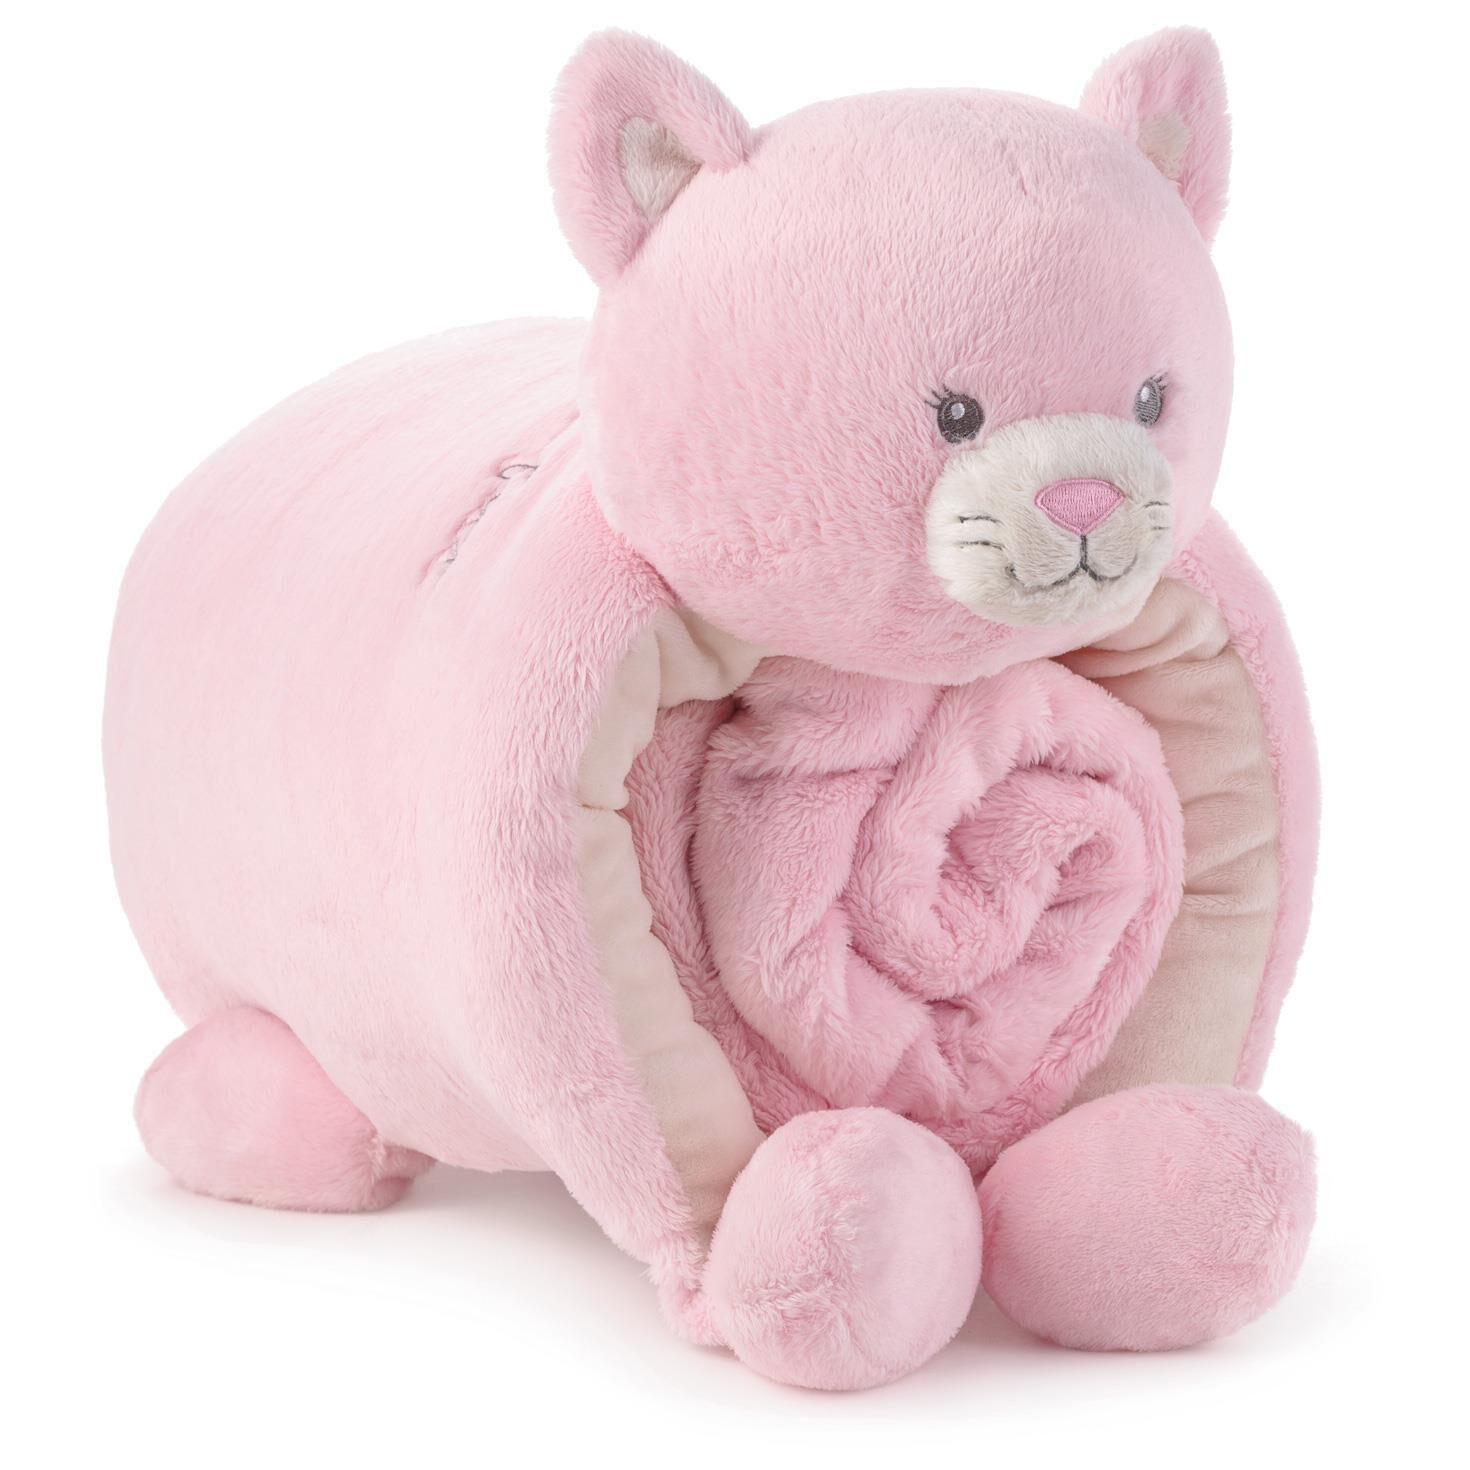 Enthralling Blanket Set Root 1bby4497 1470 1 Stuffed Animals Pink Kitty Pillow Allergies Stuffed Animals On Amazon baby Best Stuffed Animals